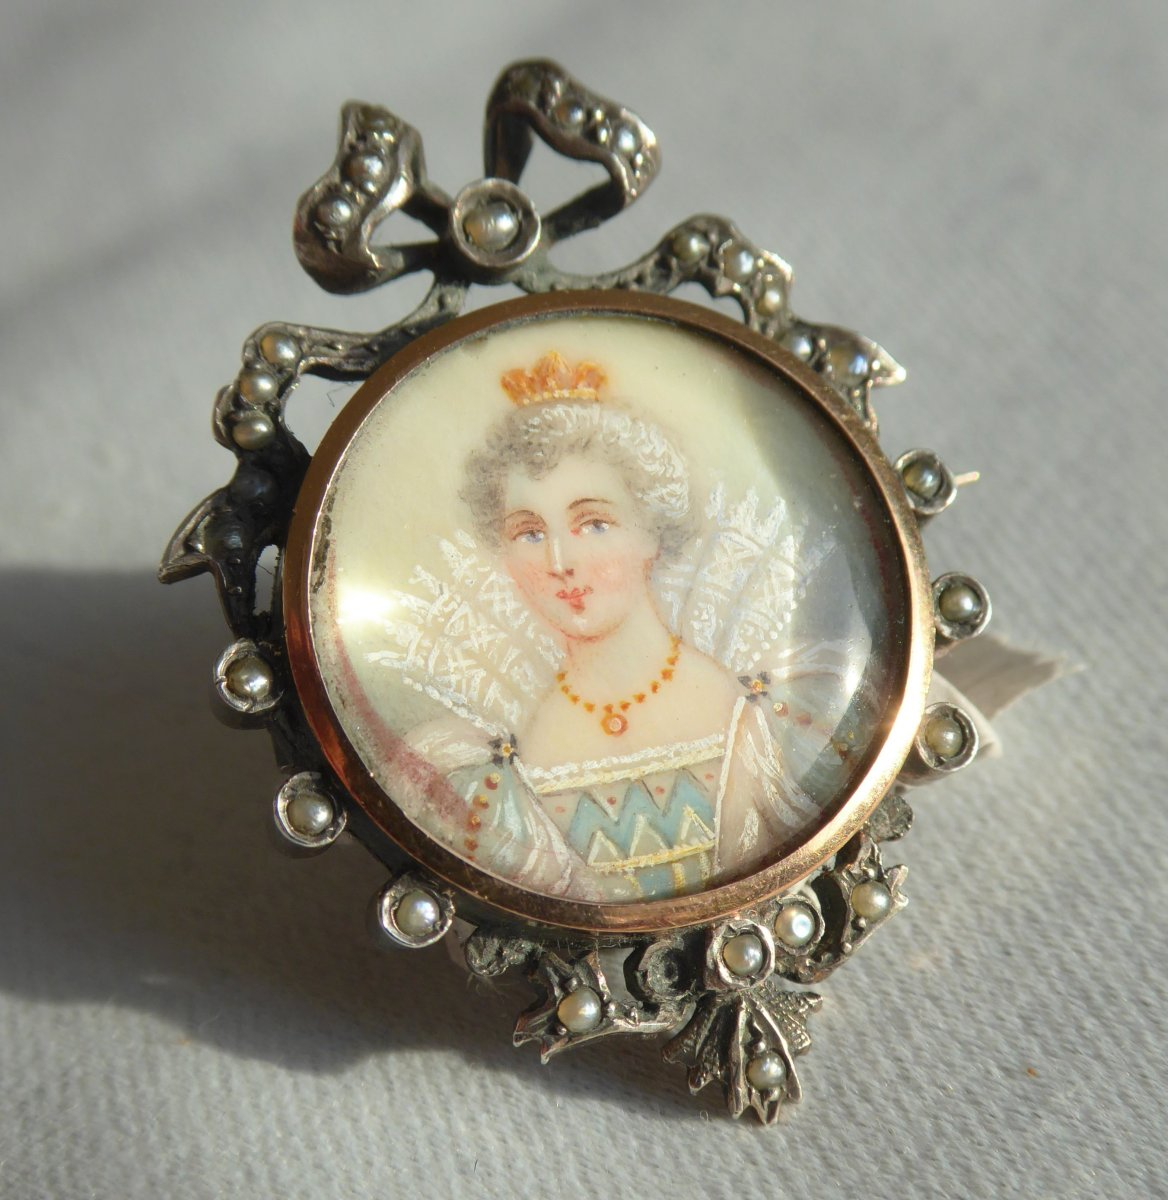 Broche époque Napoléon III Portrait De La Reine De France Marie De Medicis Bijou XIXe Royaliste